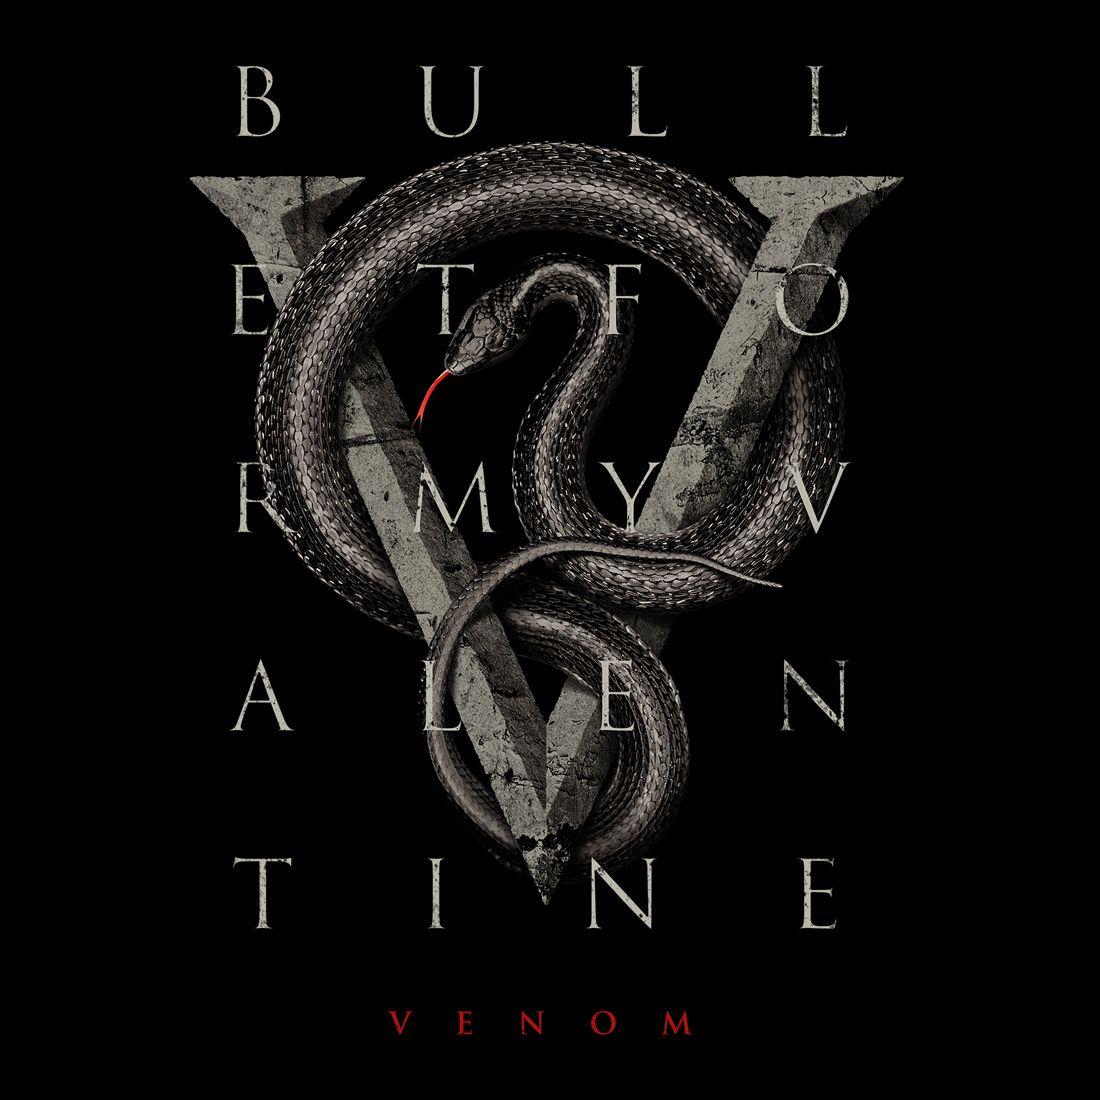 Bullet For My Valentine 2015 Venom Bullet For My